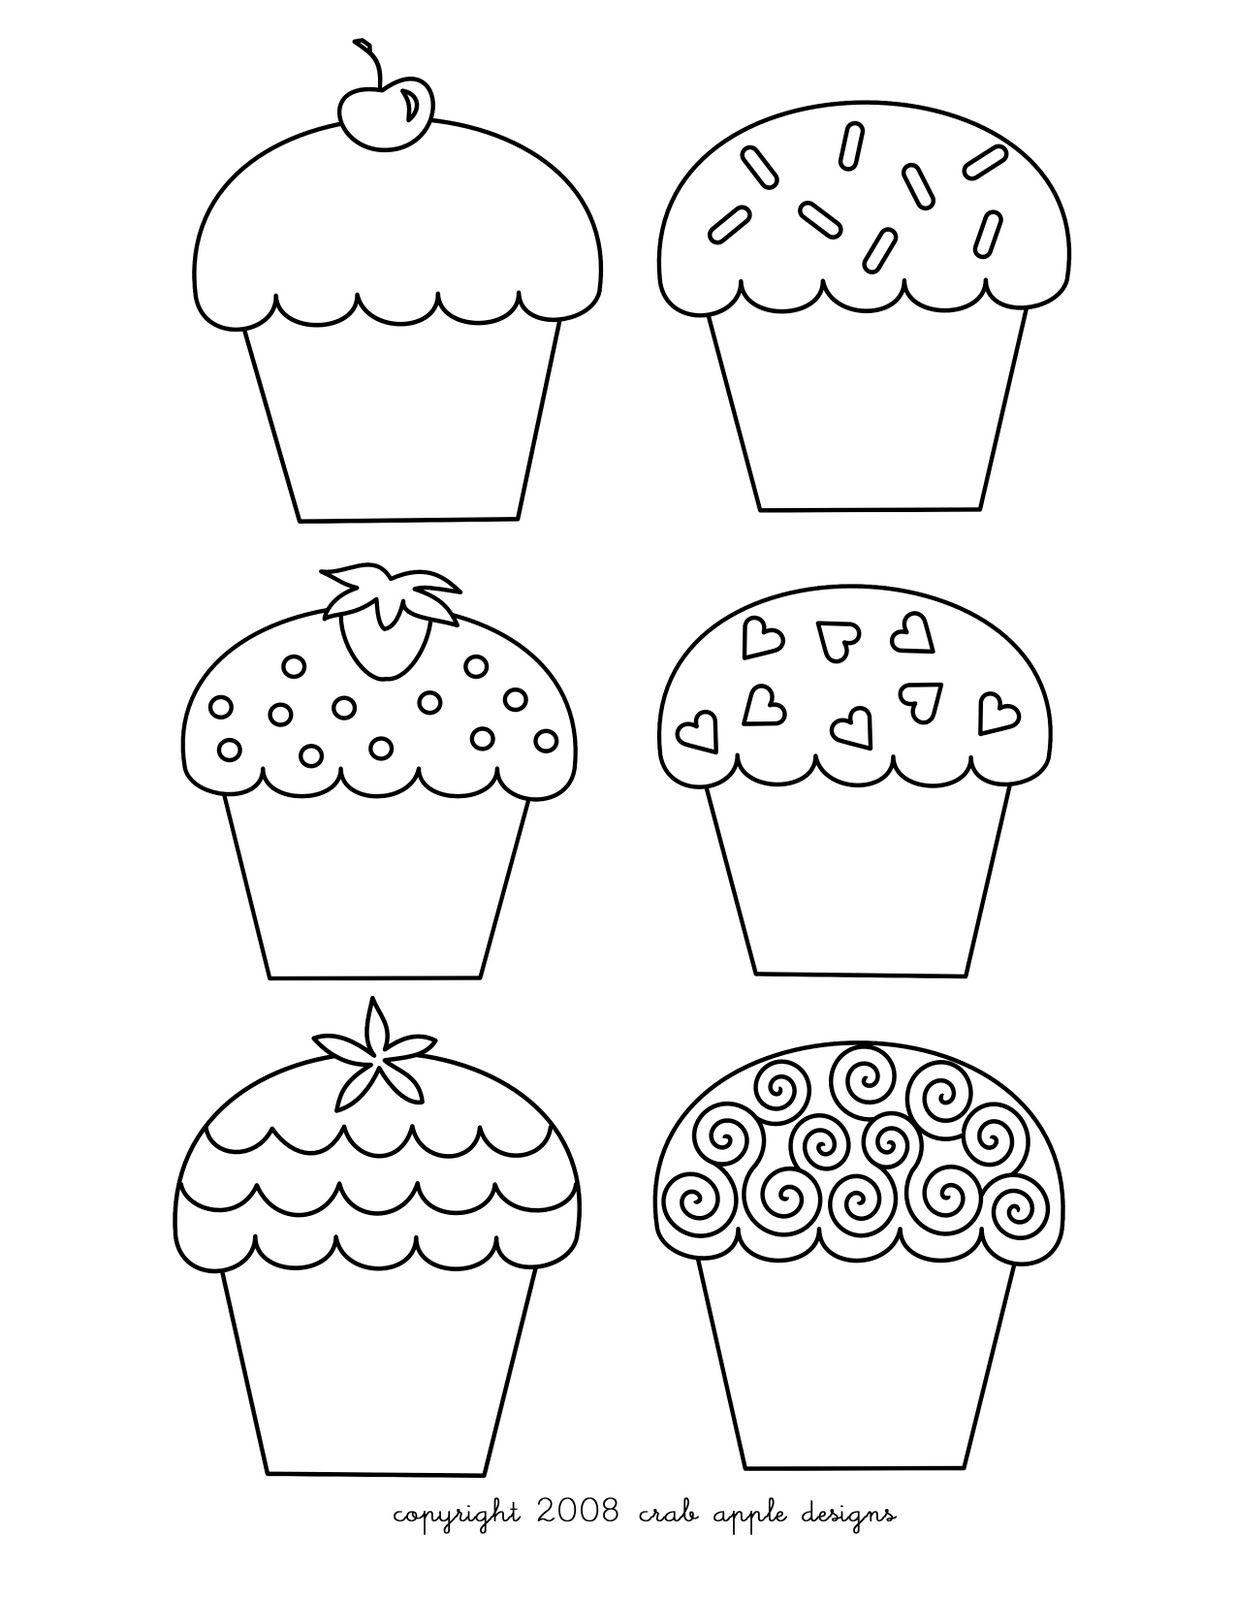 artesanato e cia: moldes de cupcakes (riscos) postagem programada ... - Coloring Pages Pretty Cupcakes